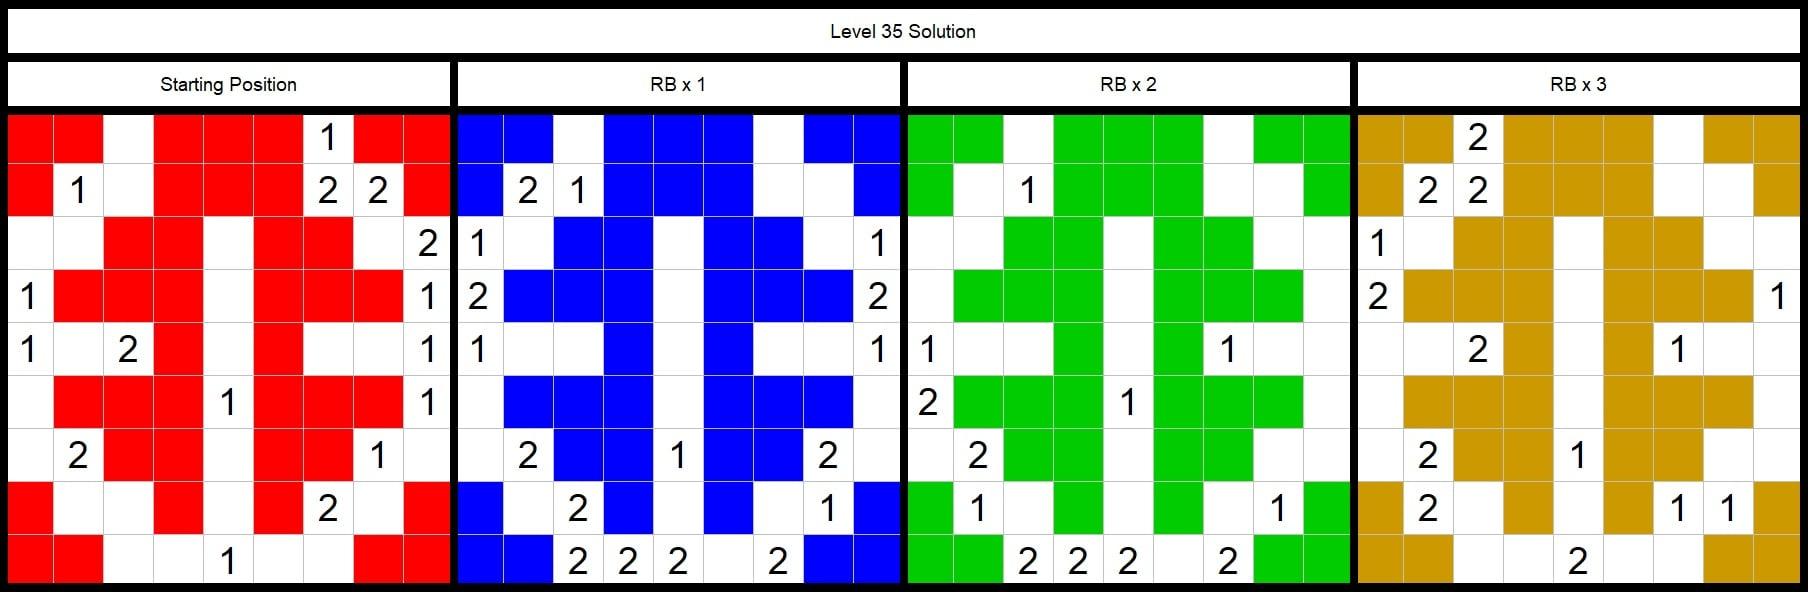 Level 35 Solution